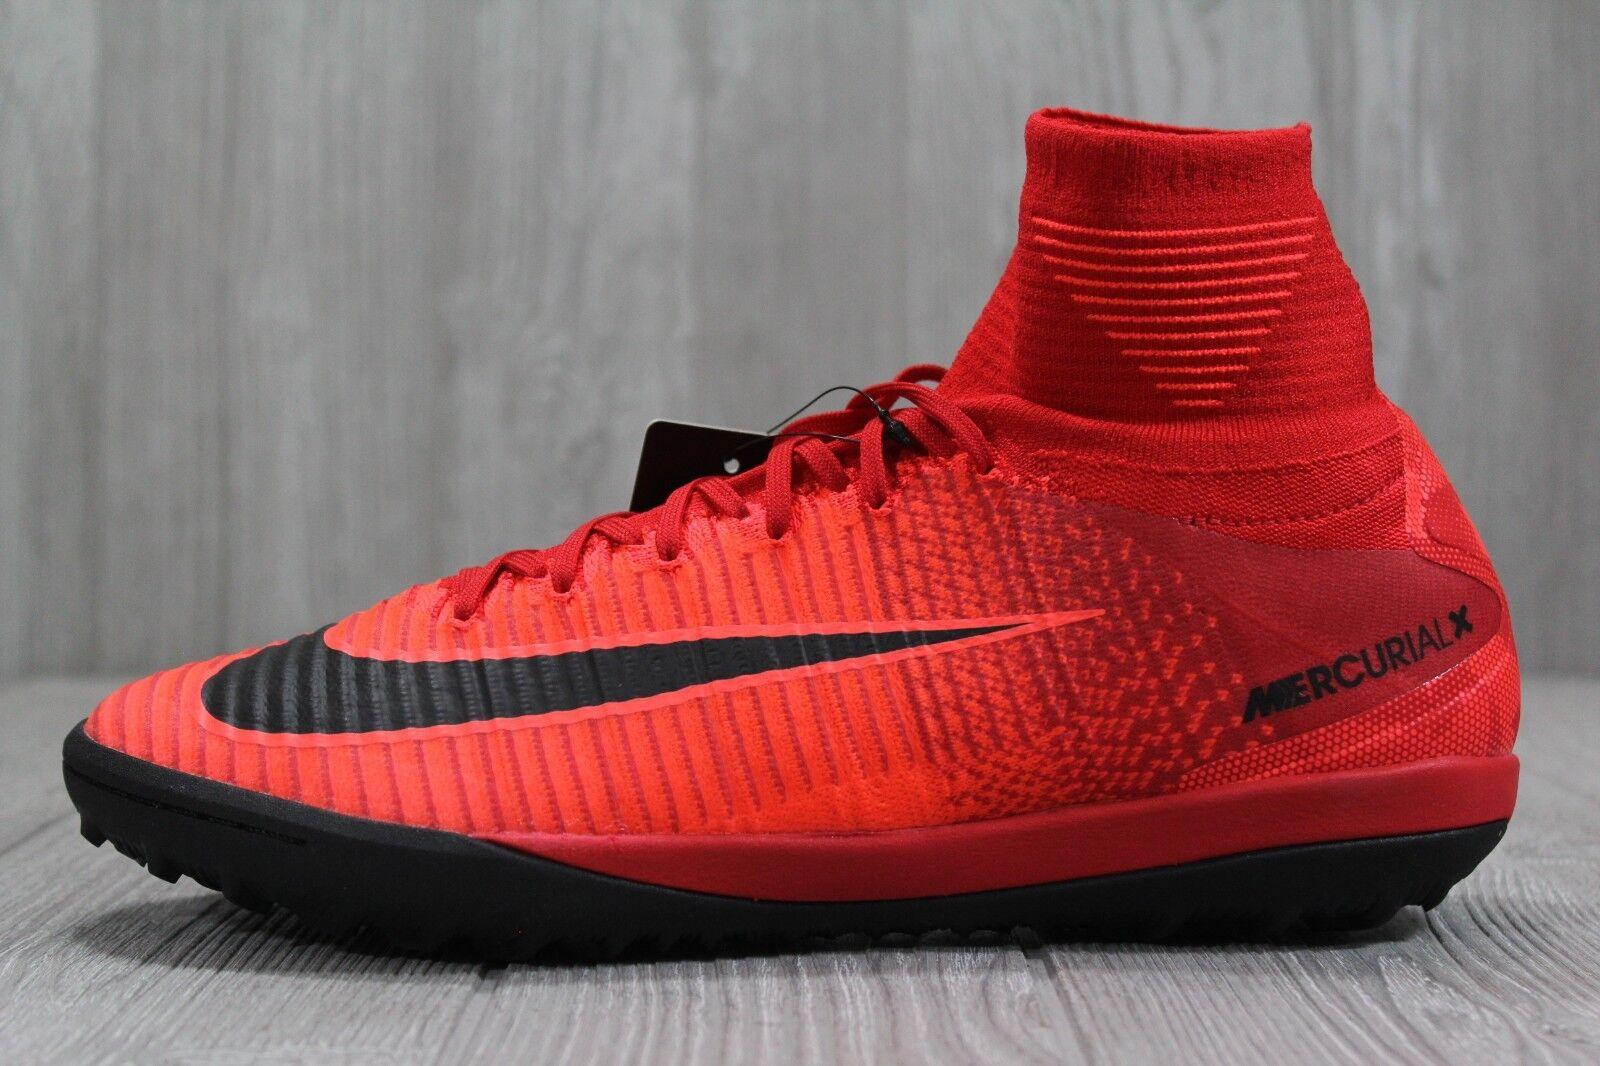 36 Nike MercurialX Proximo II DF TF Men's Turf Soccer shoes Red 831977-616 10.5